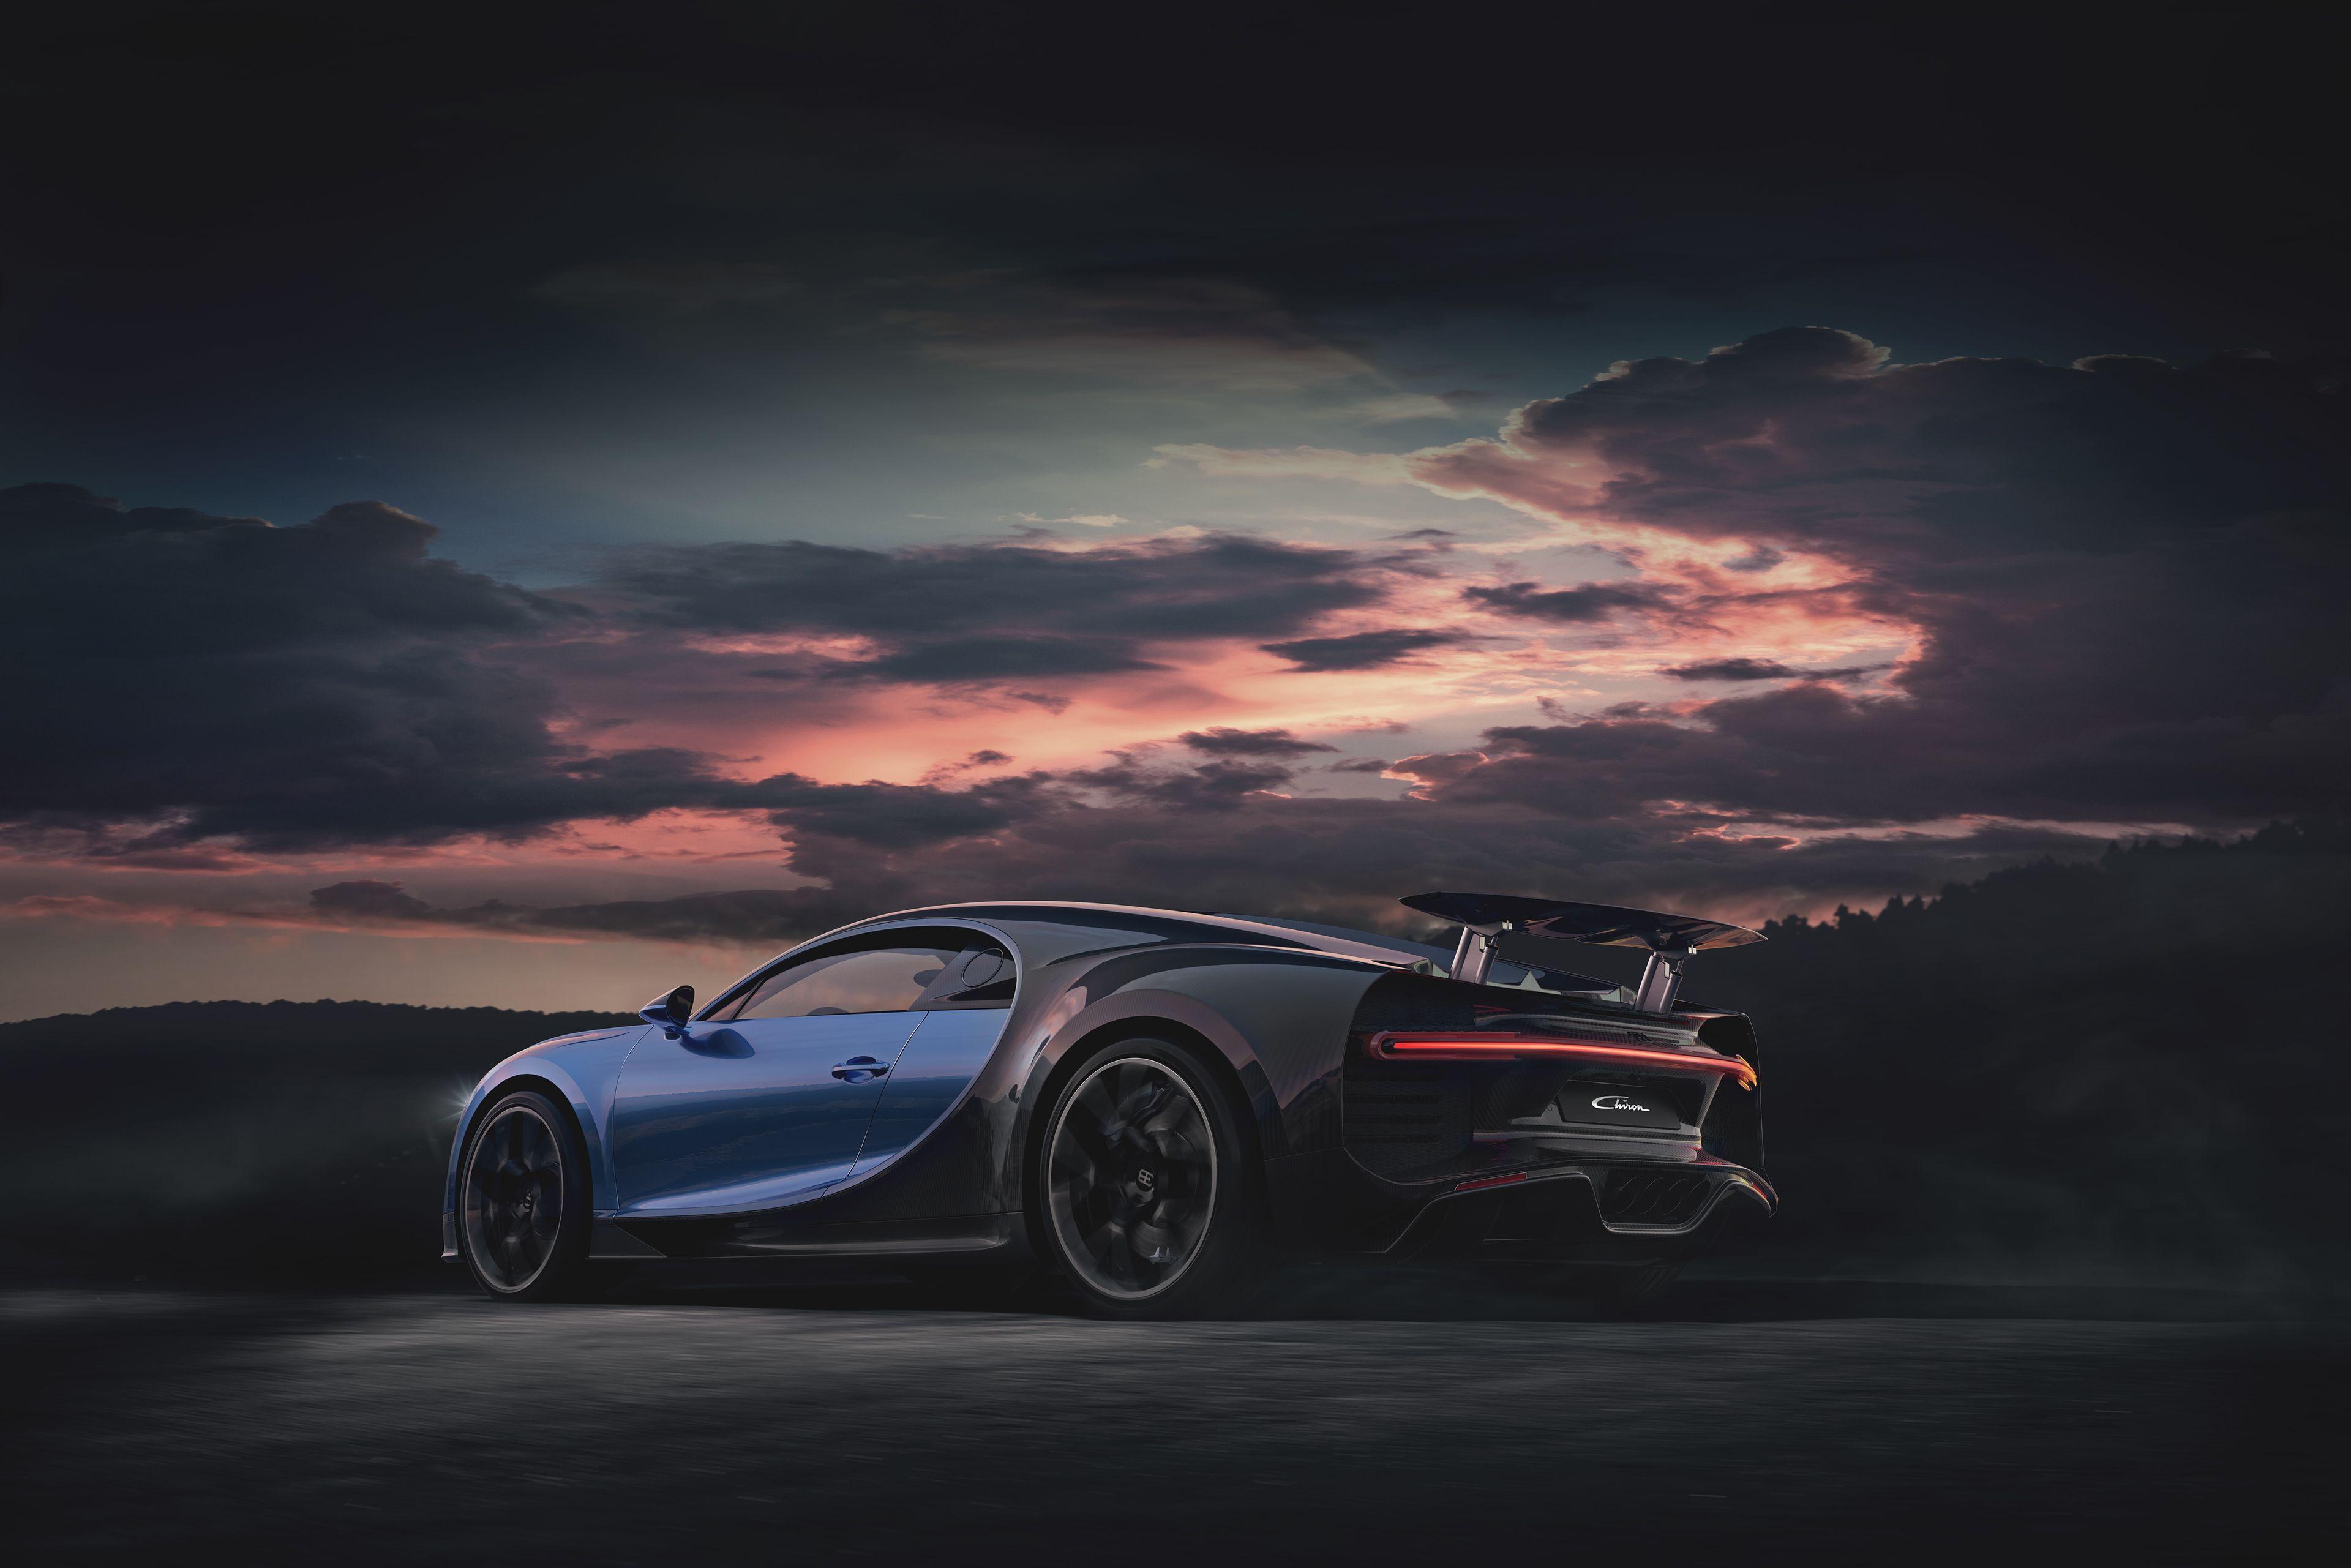 Blue Bugatti Chiron Sport 2020 4k Blue Bugatti Chiron Sport 2020 4k Wallpapers In 2021 Bugatti Chiron Bugatti Bugatti Chiron Sport